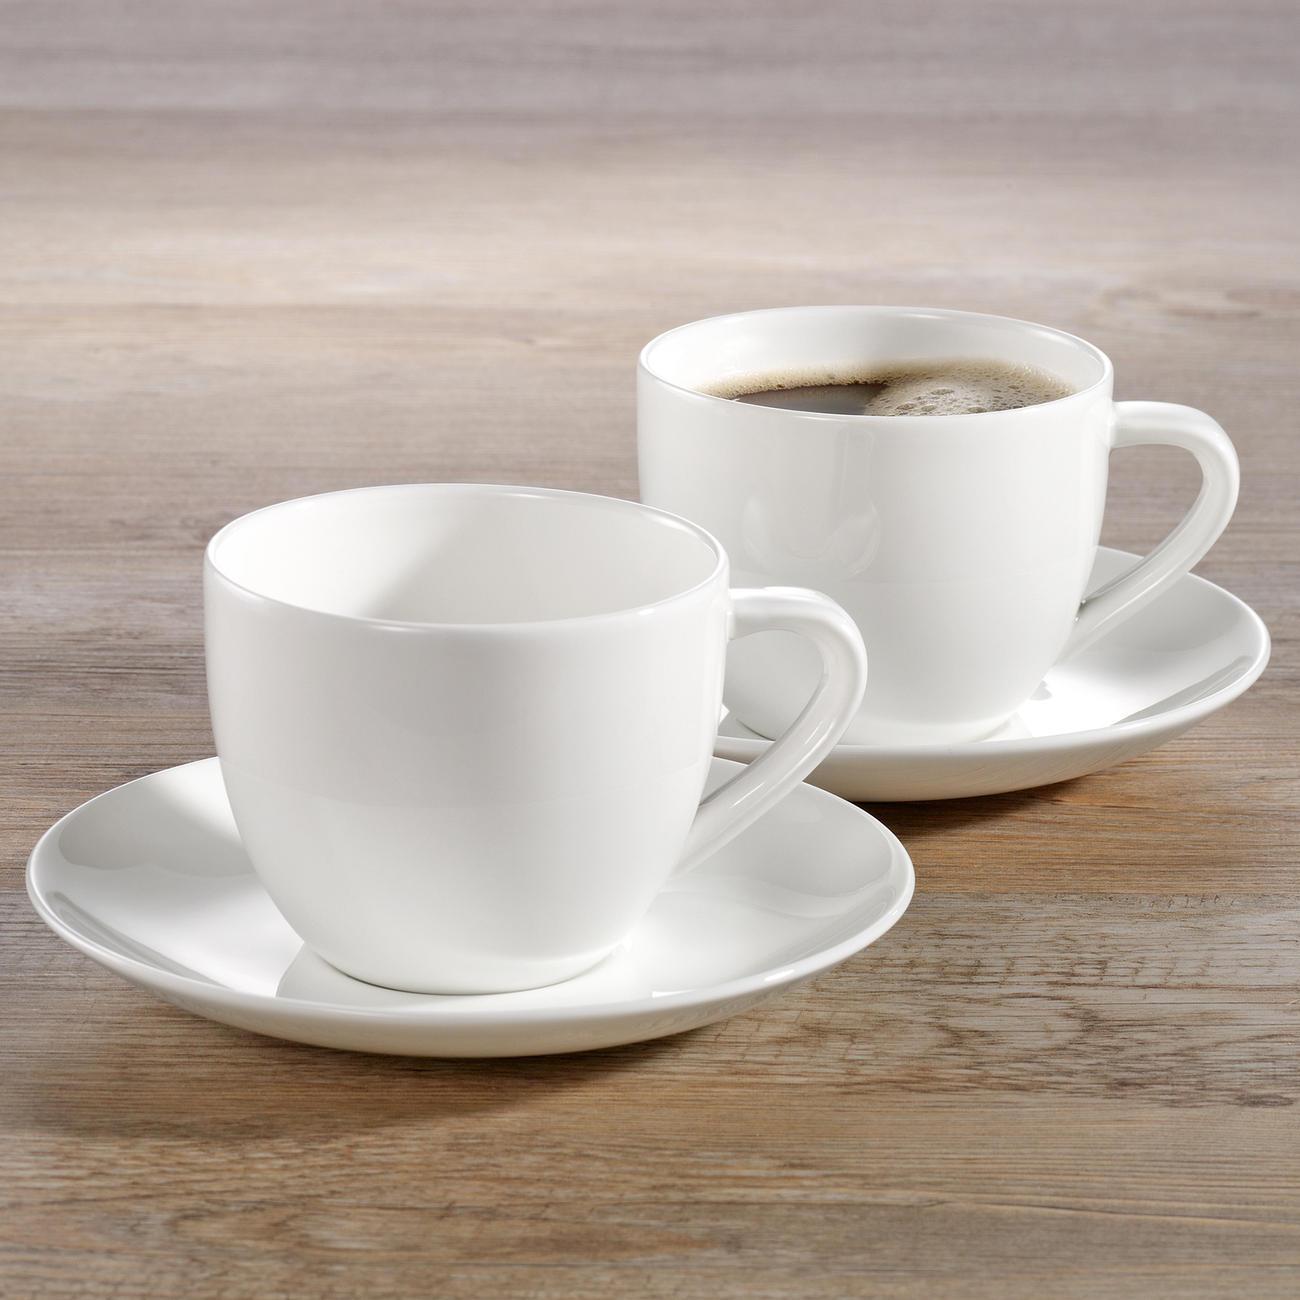 asa selection a table espressotasse mit untersetzer 70 ml 6 cm durchmesser 4 5 cm h. Black Bedroom Furniture Sets. Home Design Ideas